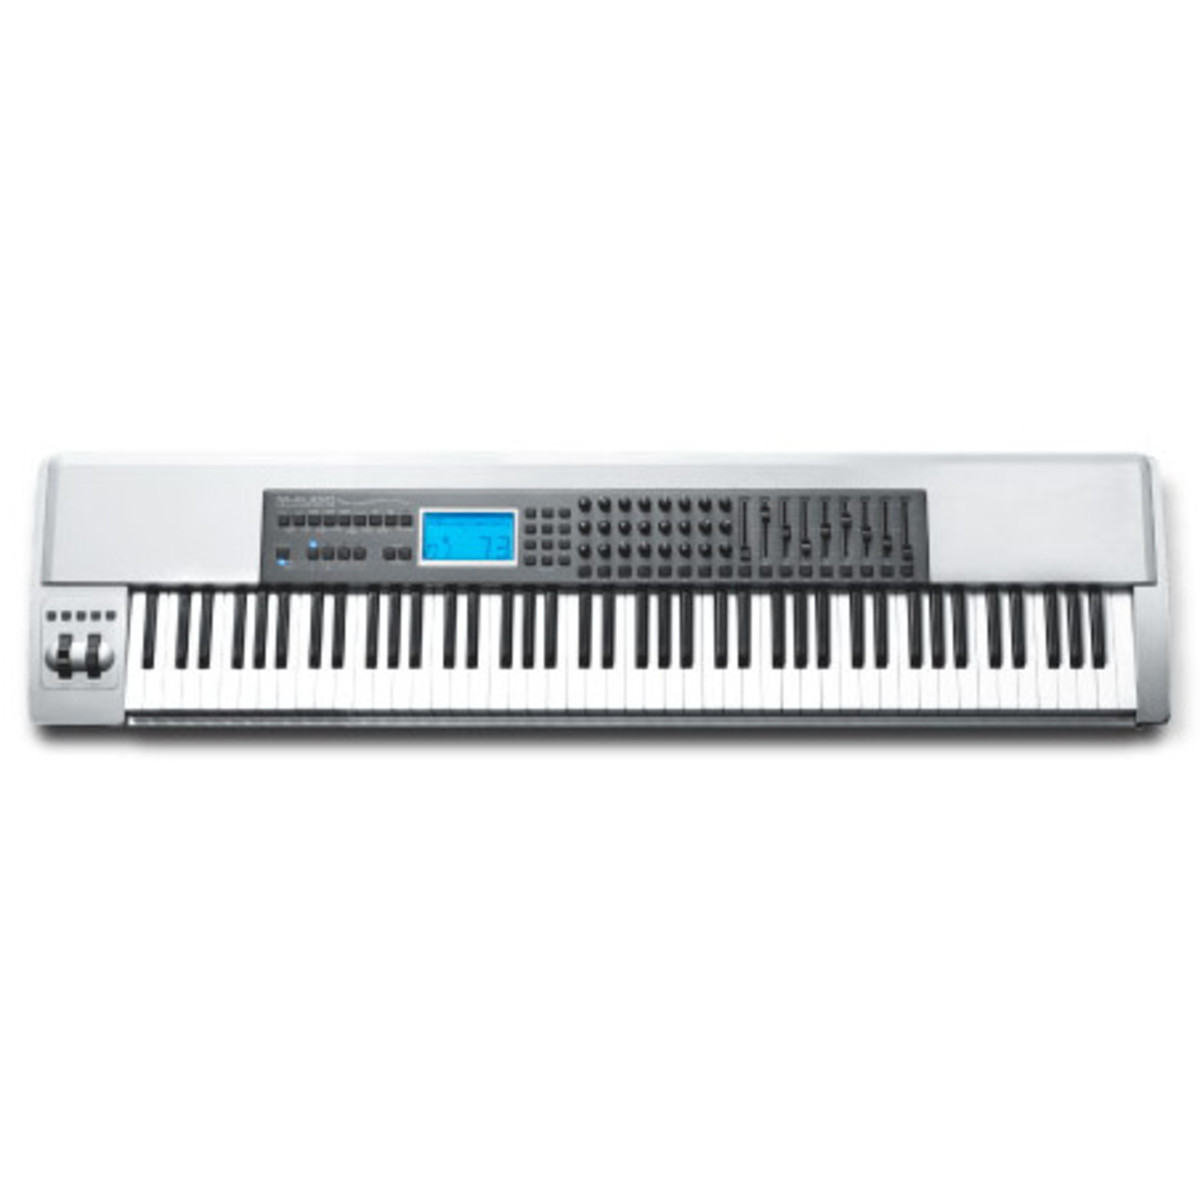 m audio abandonn es clavier midi keystation pro 88. Black Bedroom Furniture Sets. Home Design Ideas